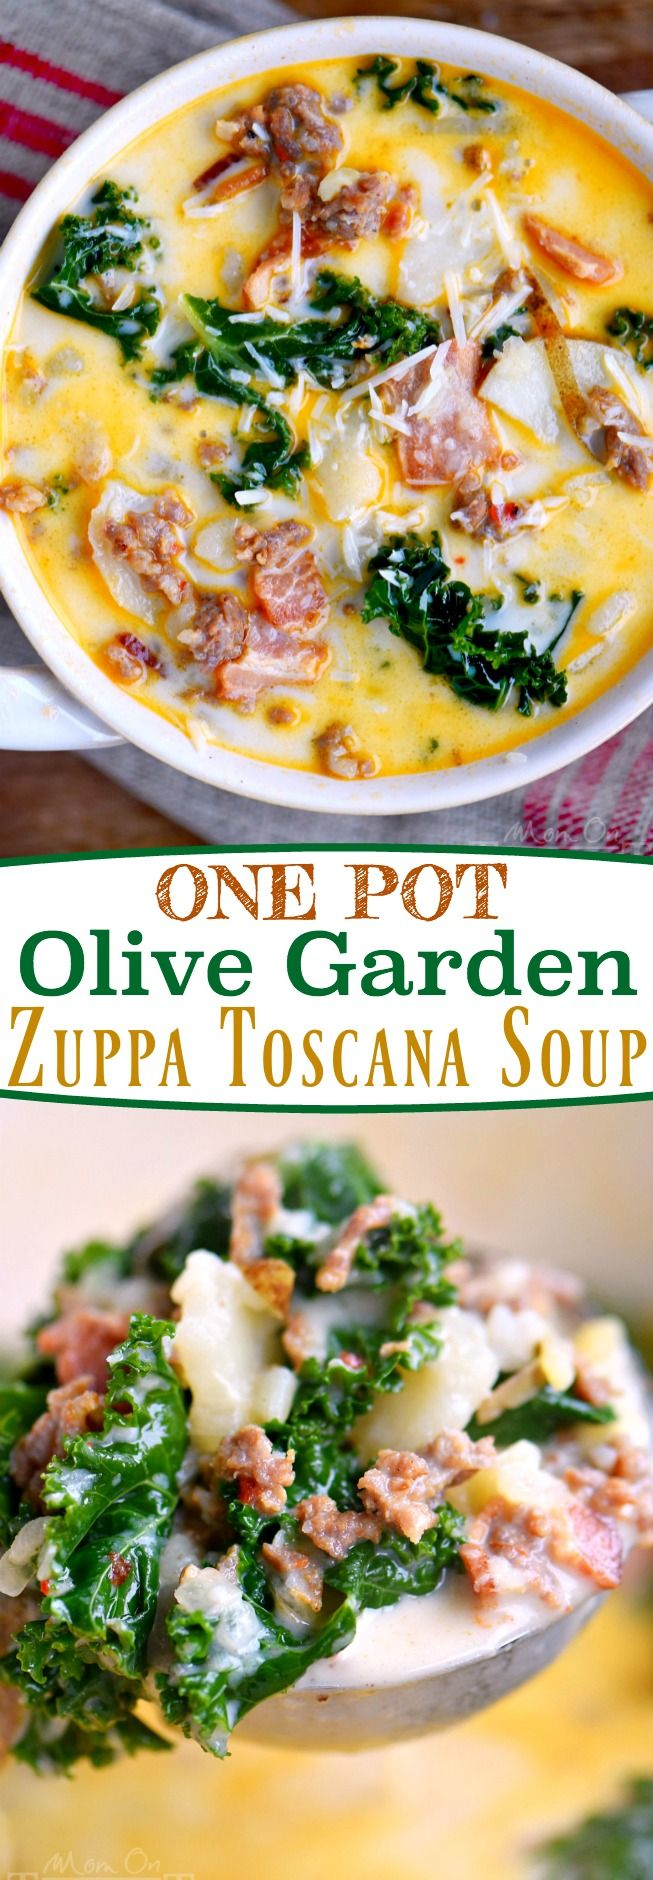 One Pot Olive Garden Zuppa Toscana Soup Olive Garden Zuppa Toscana Zuppa Toscana Soup And